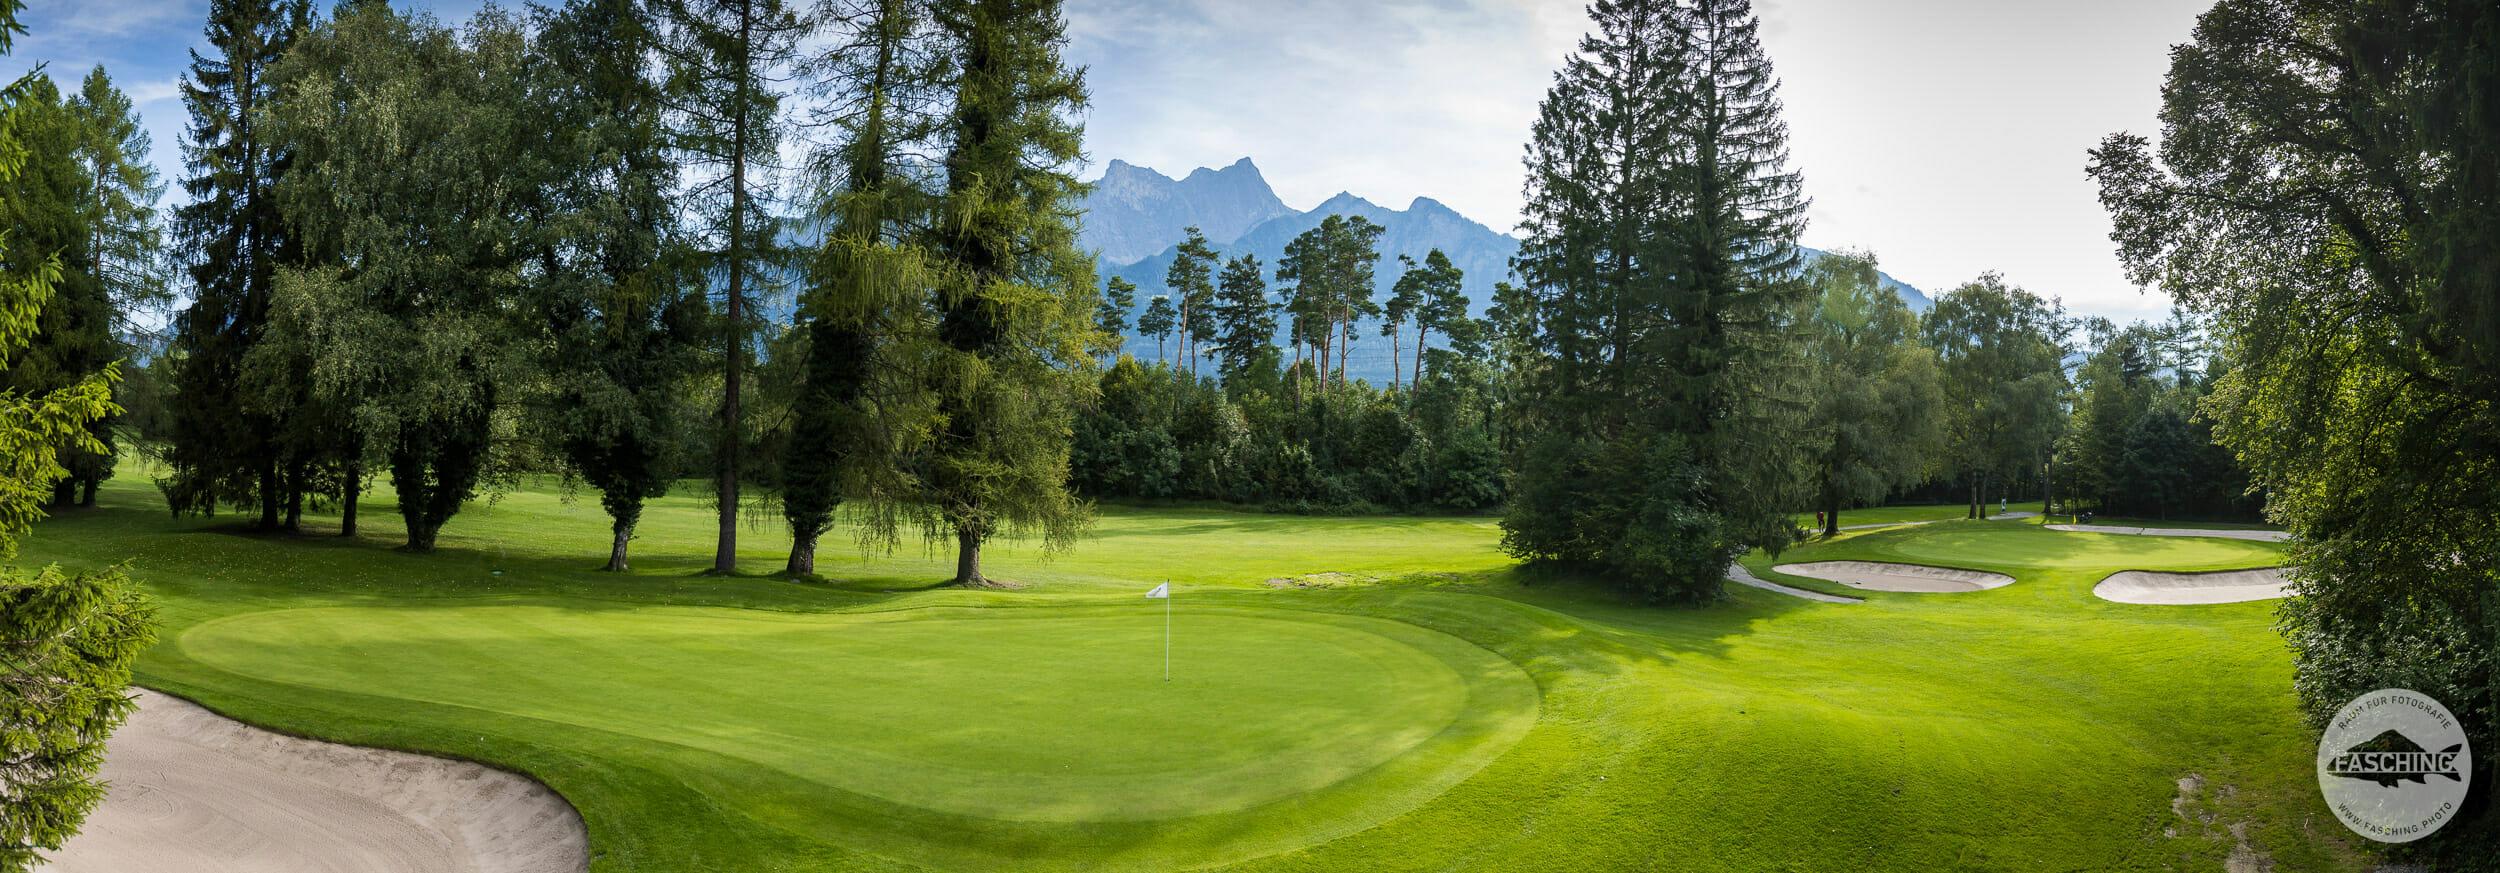 Golfclub Bad Ragaz, Fotografie Reinhard Fasching